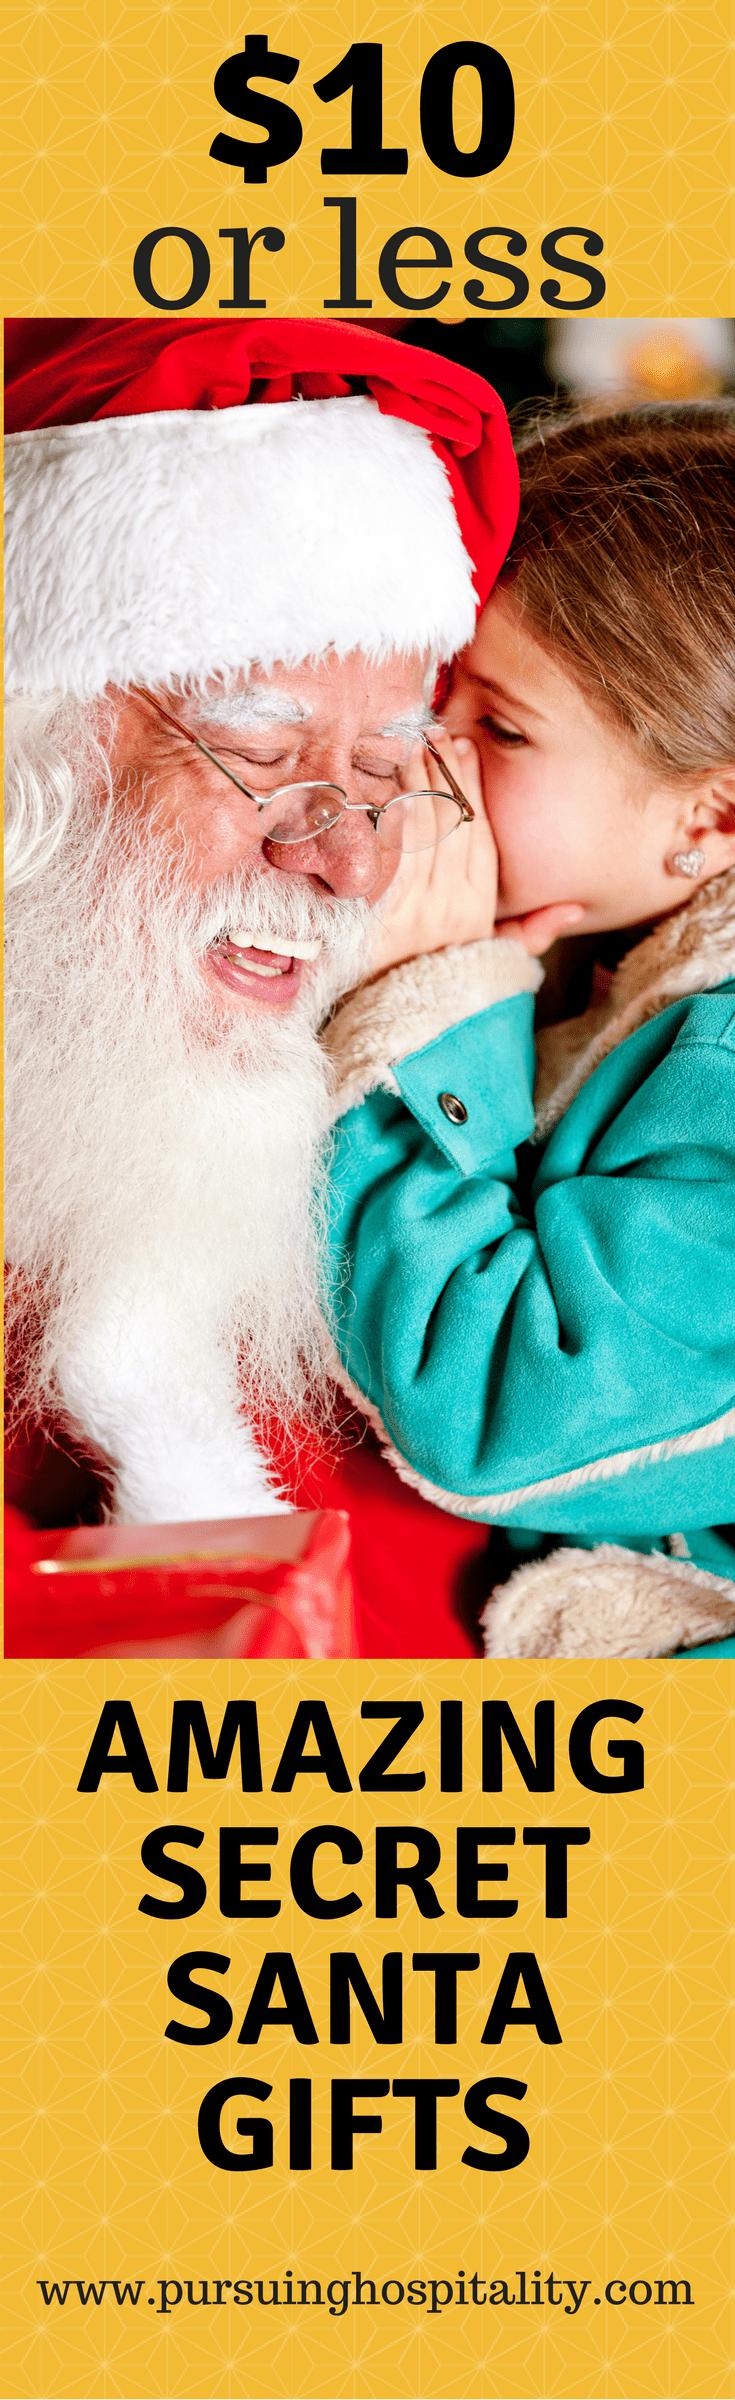 Amazing Secret Santa Gift Ideas